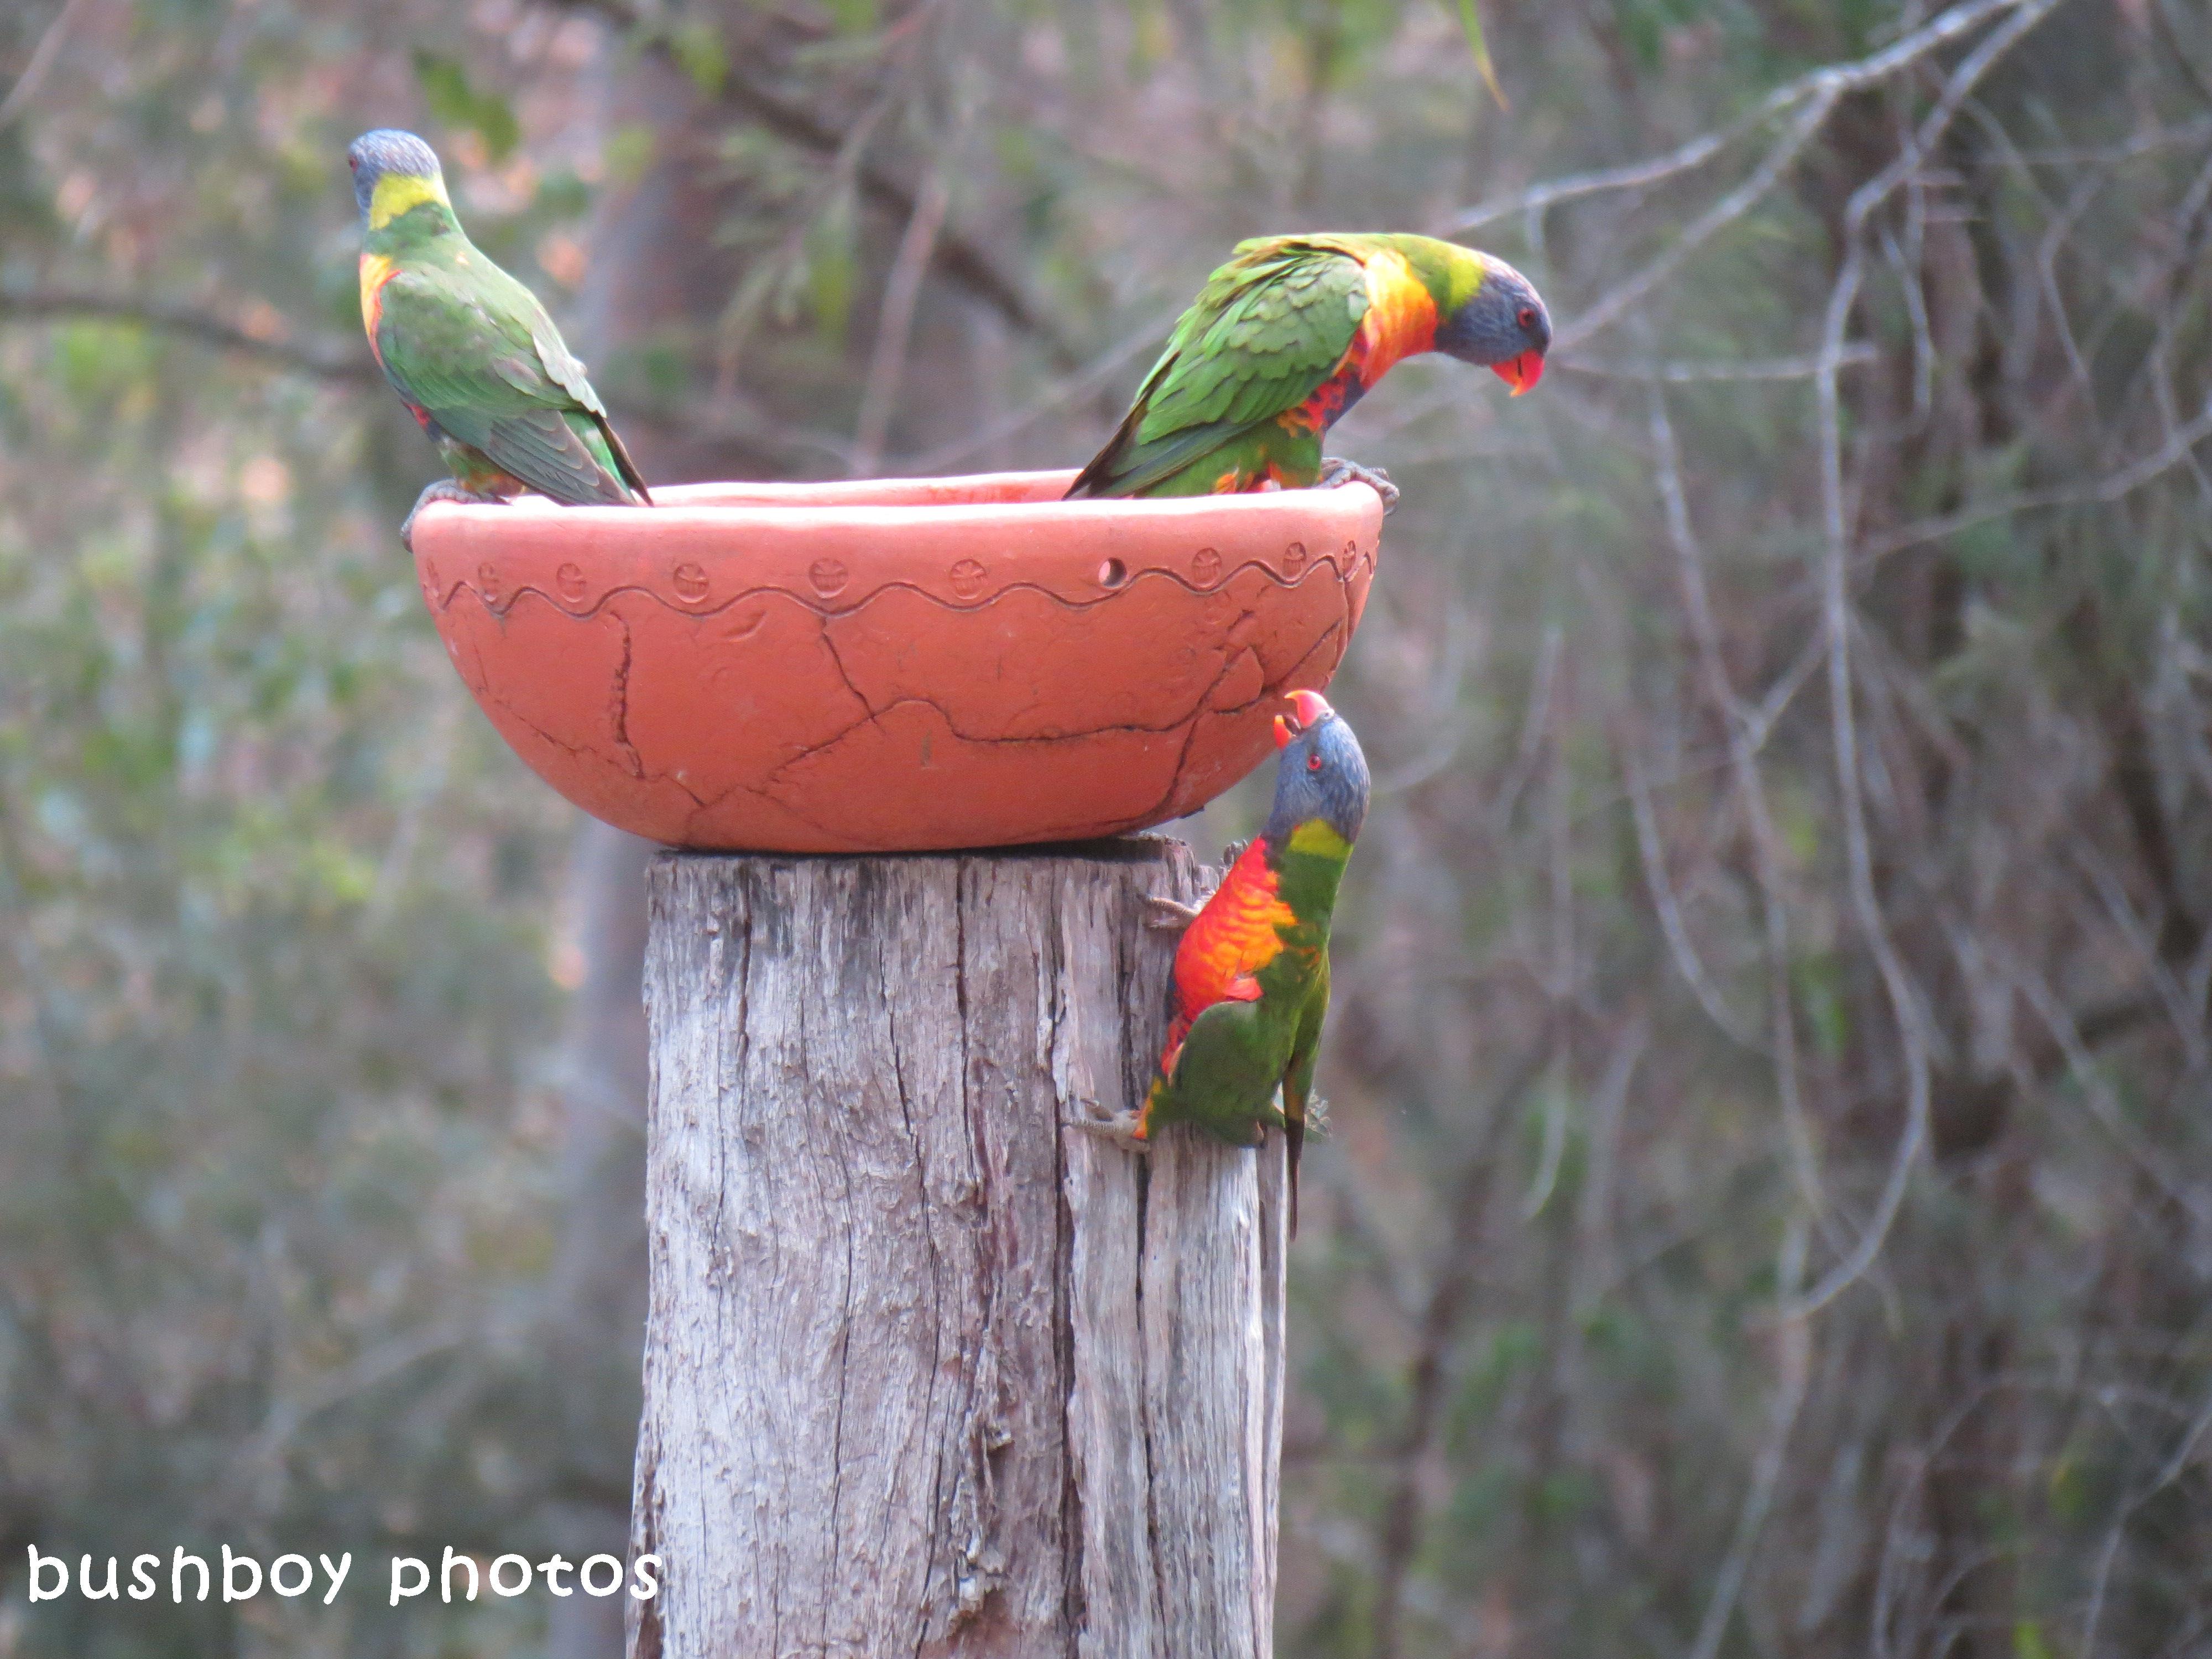 180329_blog challenge_quartet_rainbow lorikeets1